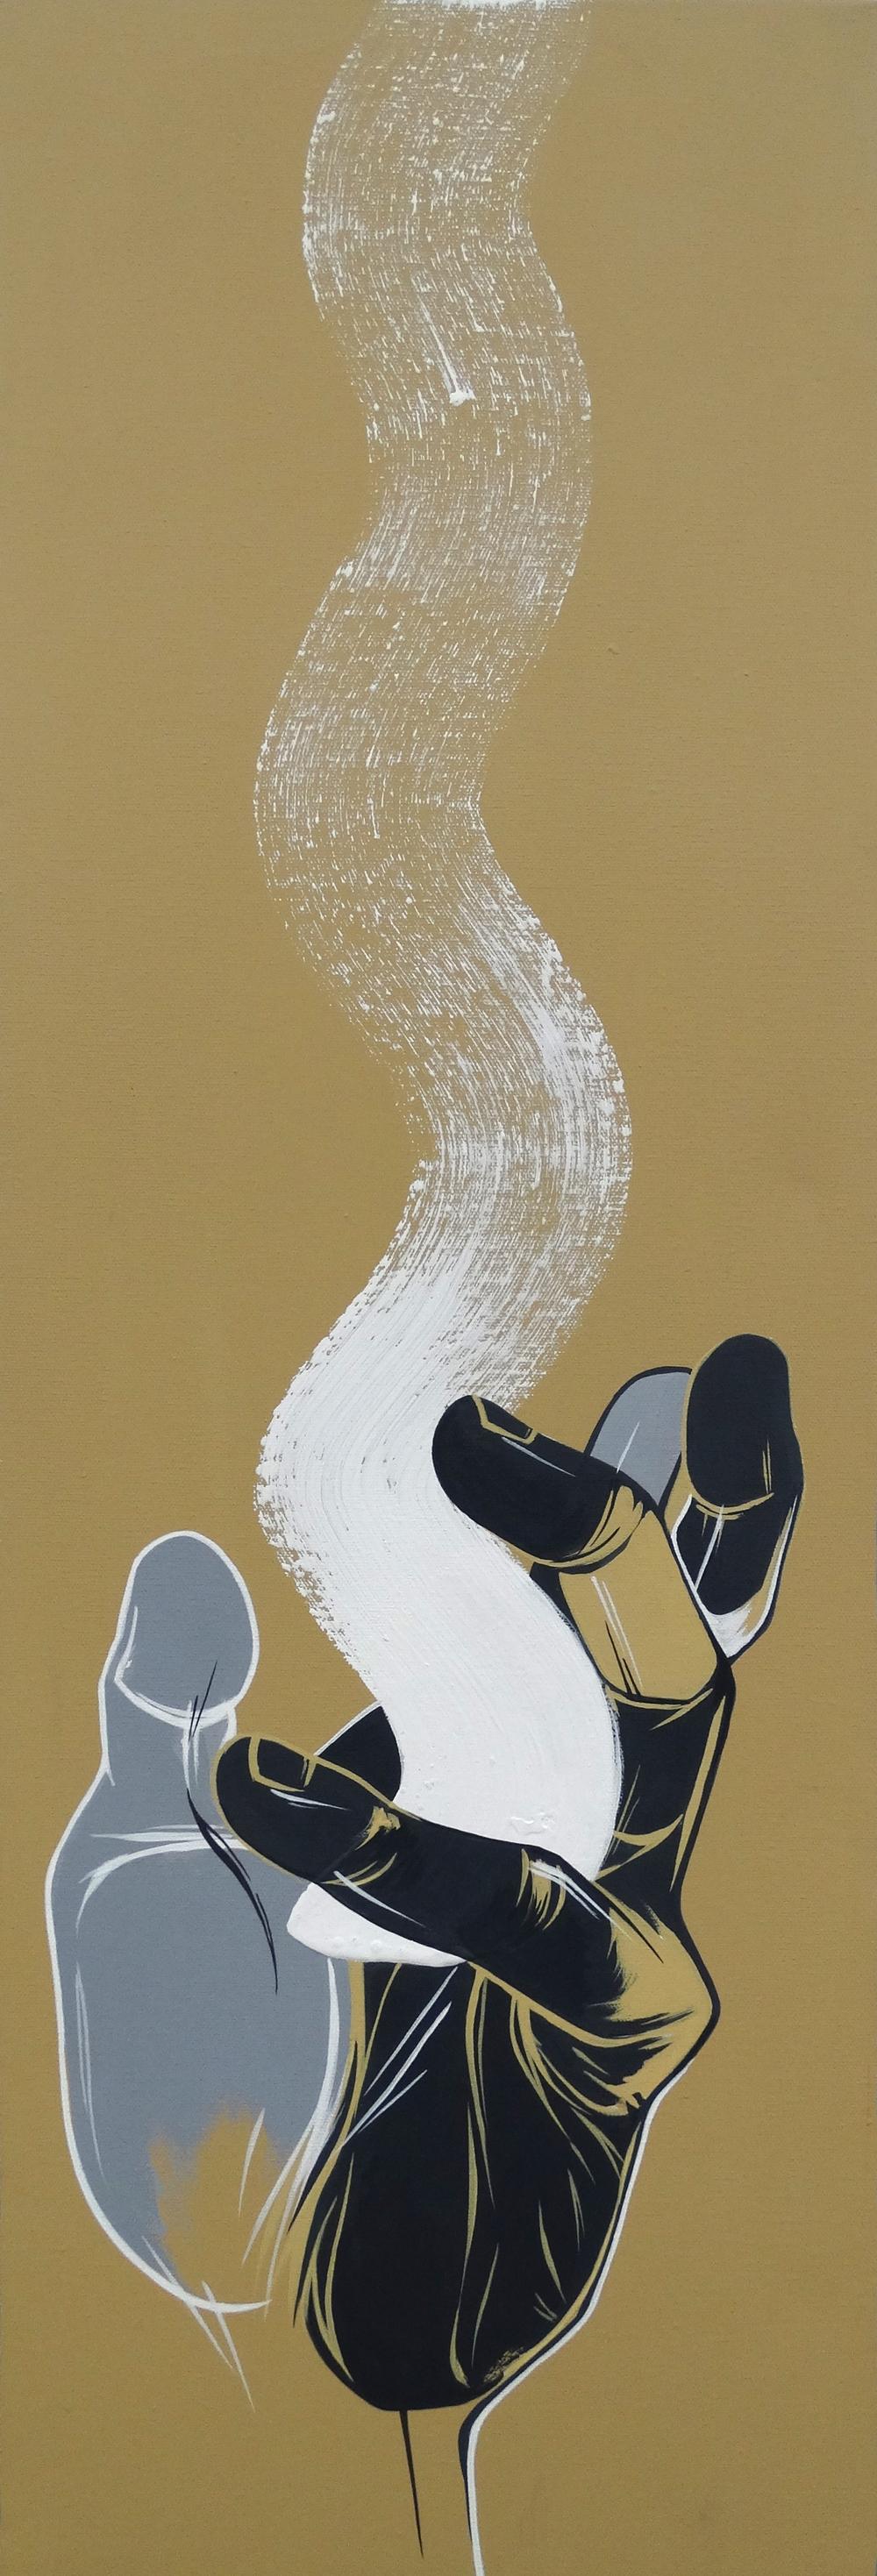 "Meditation   12"" x 36""Acrylic on Canvas  SOLD"